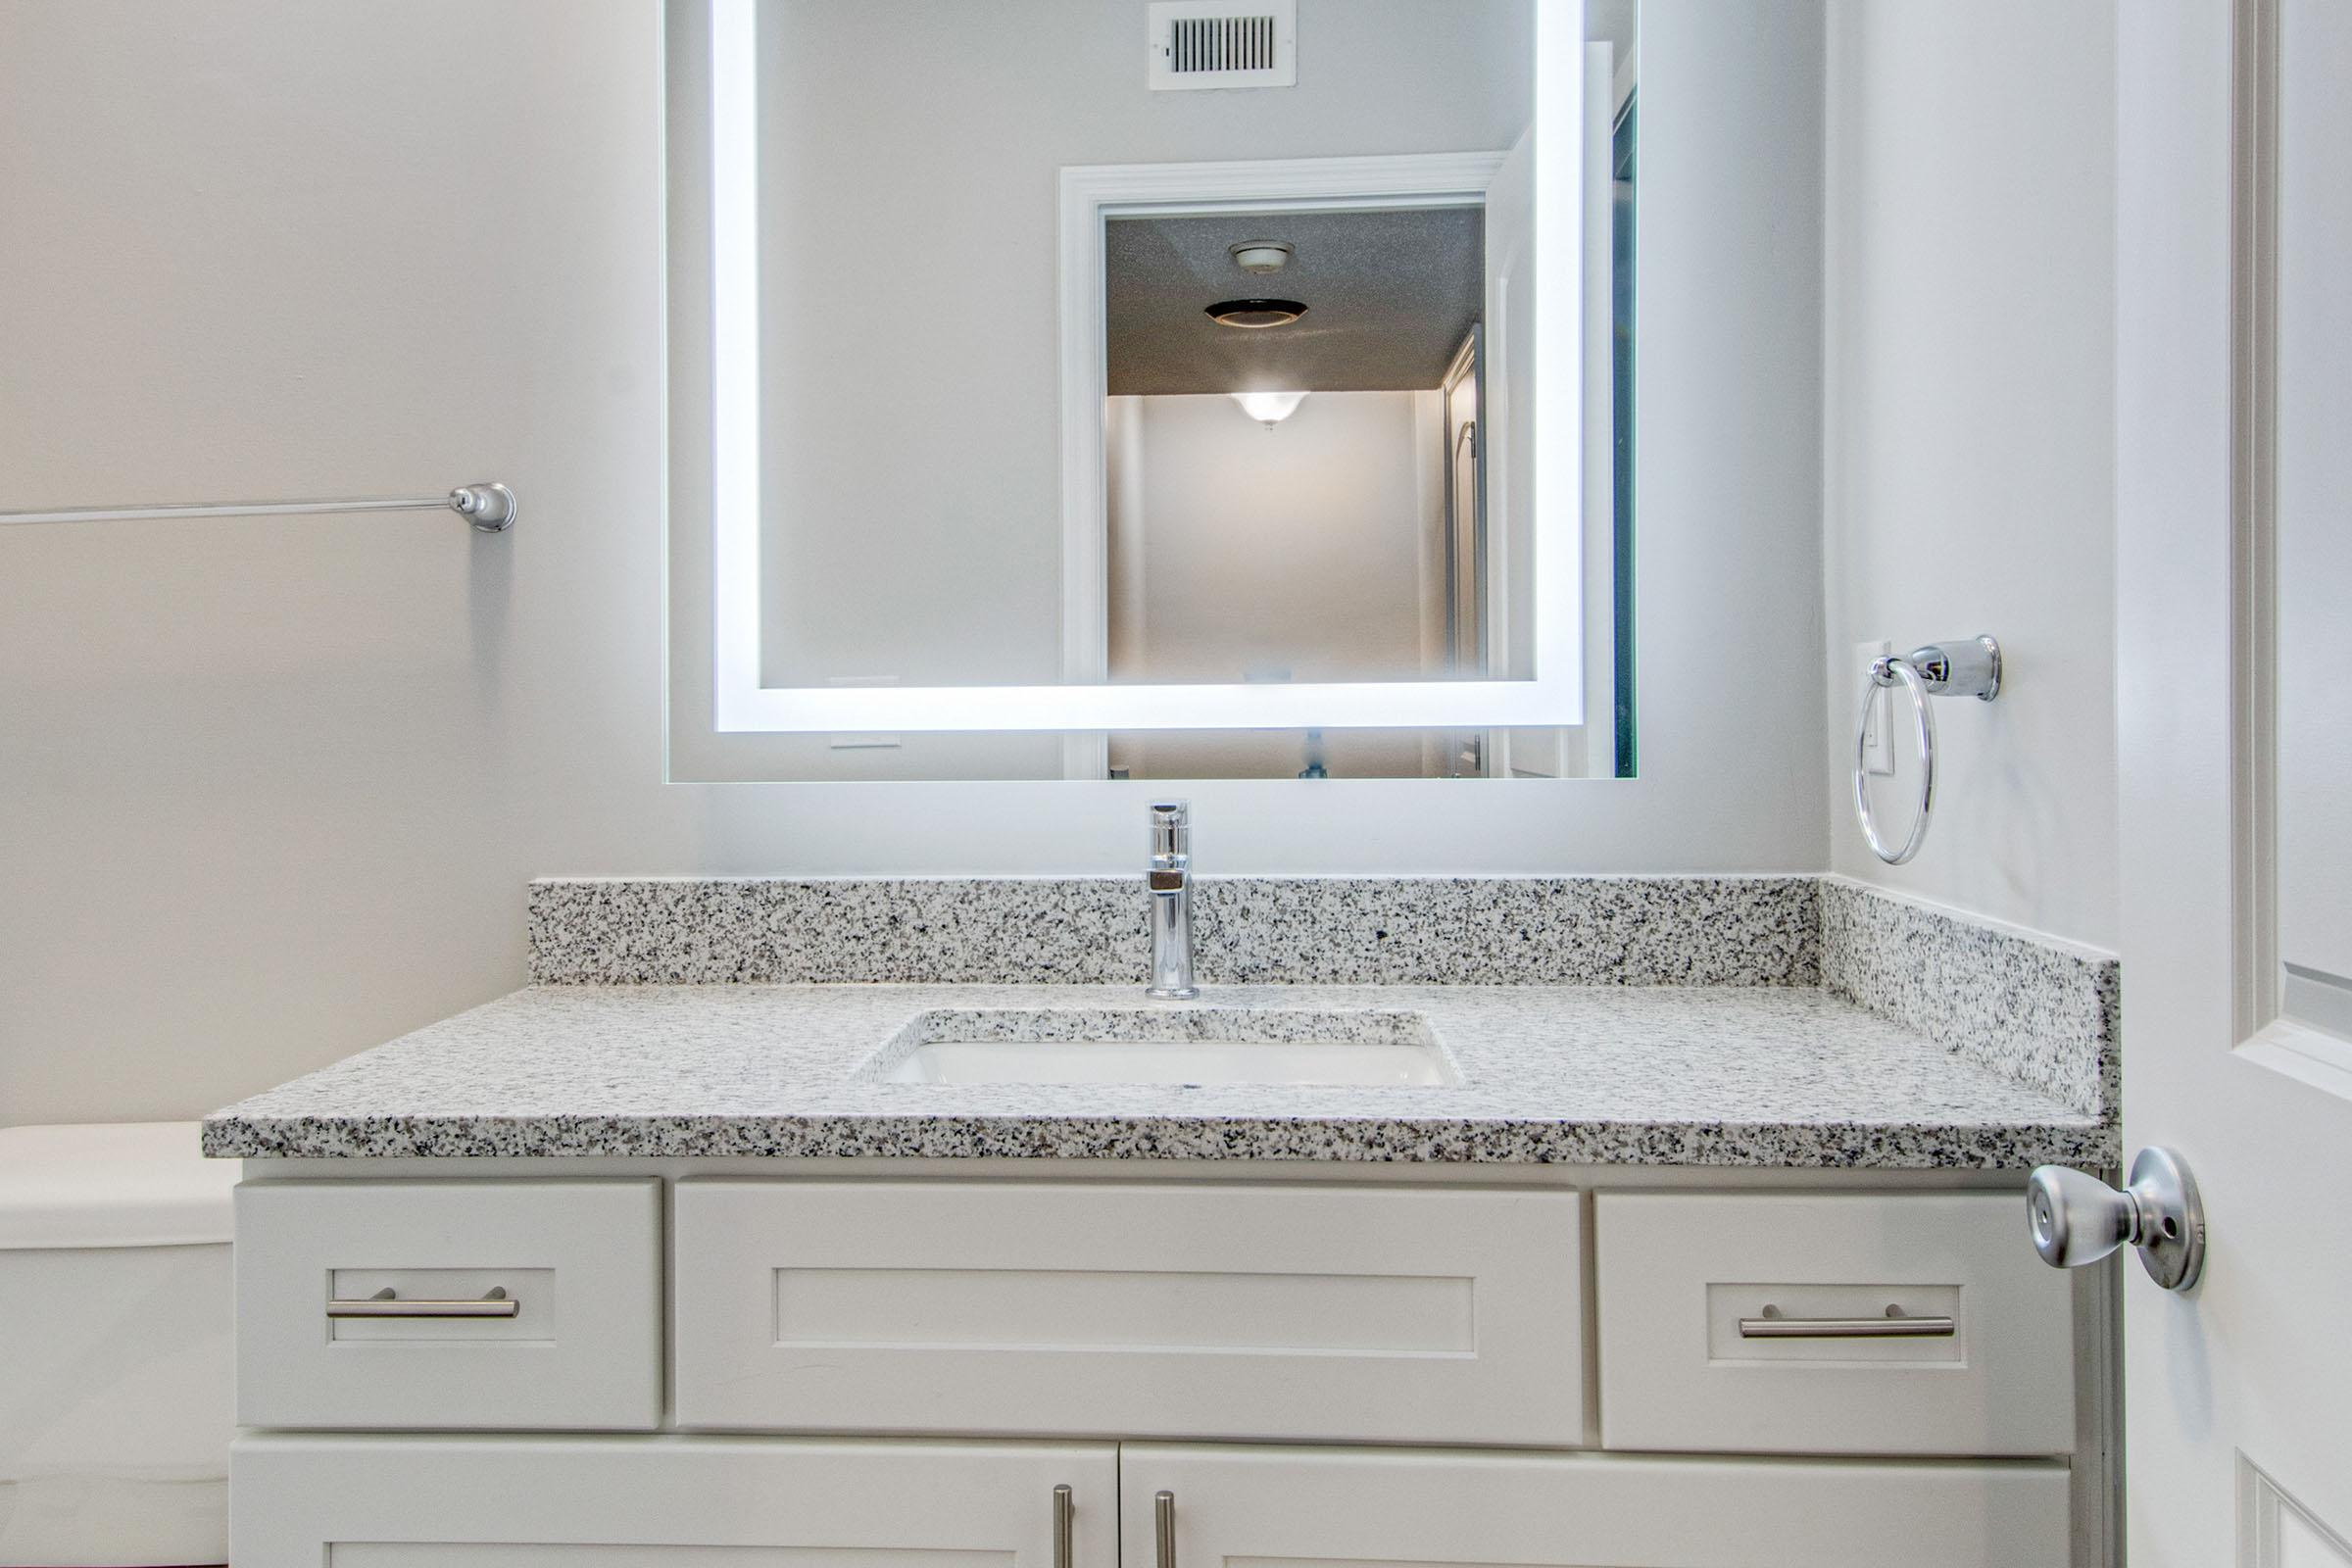 Bathroom vanity with lighted mirror